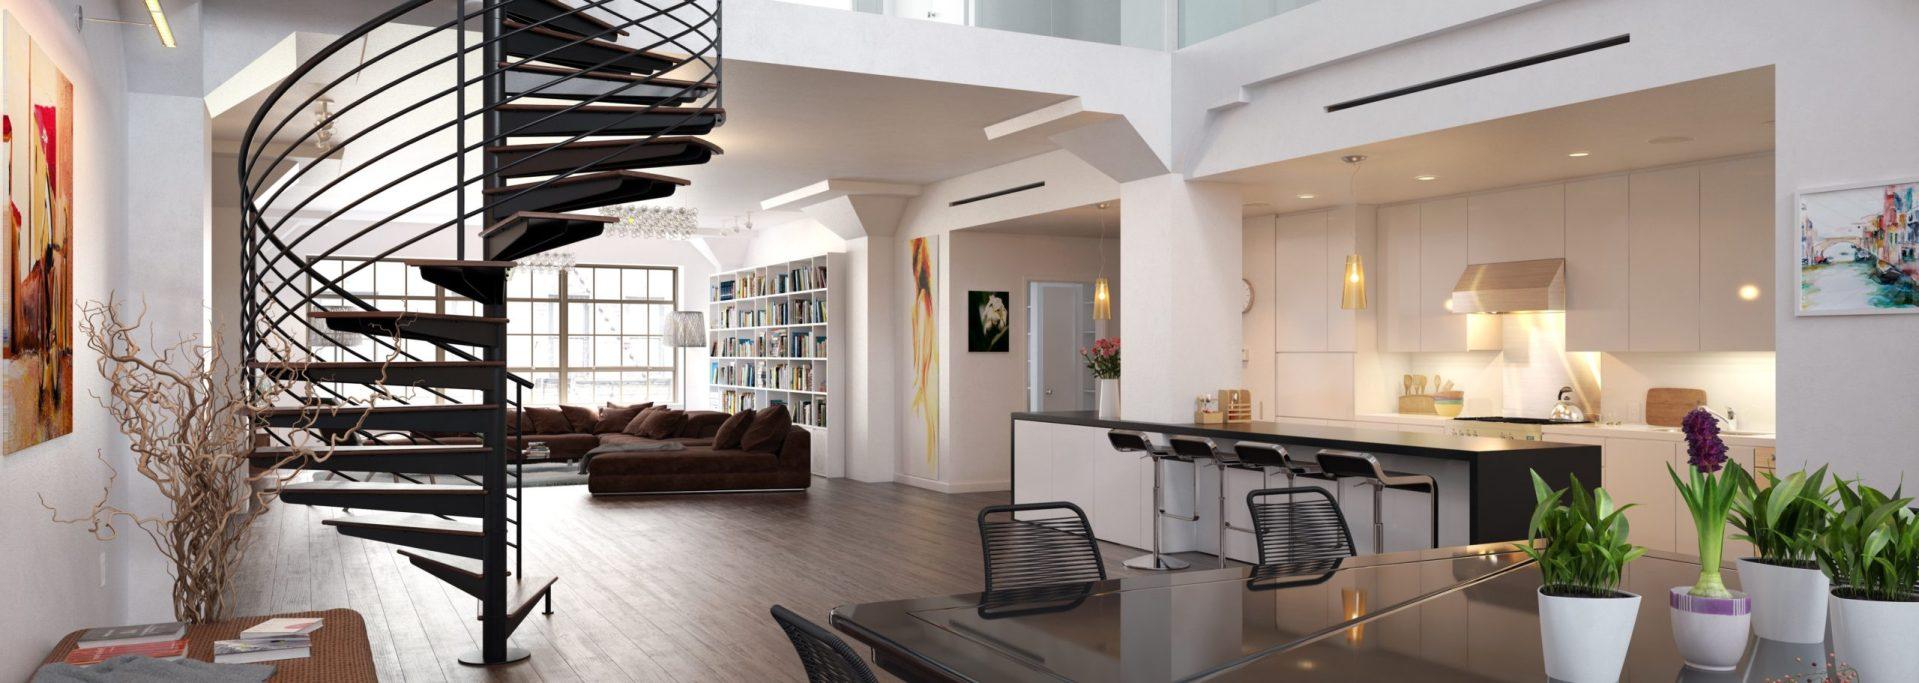 Luxury New York City Lofts for Sale